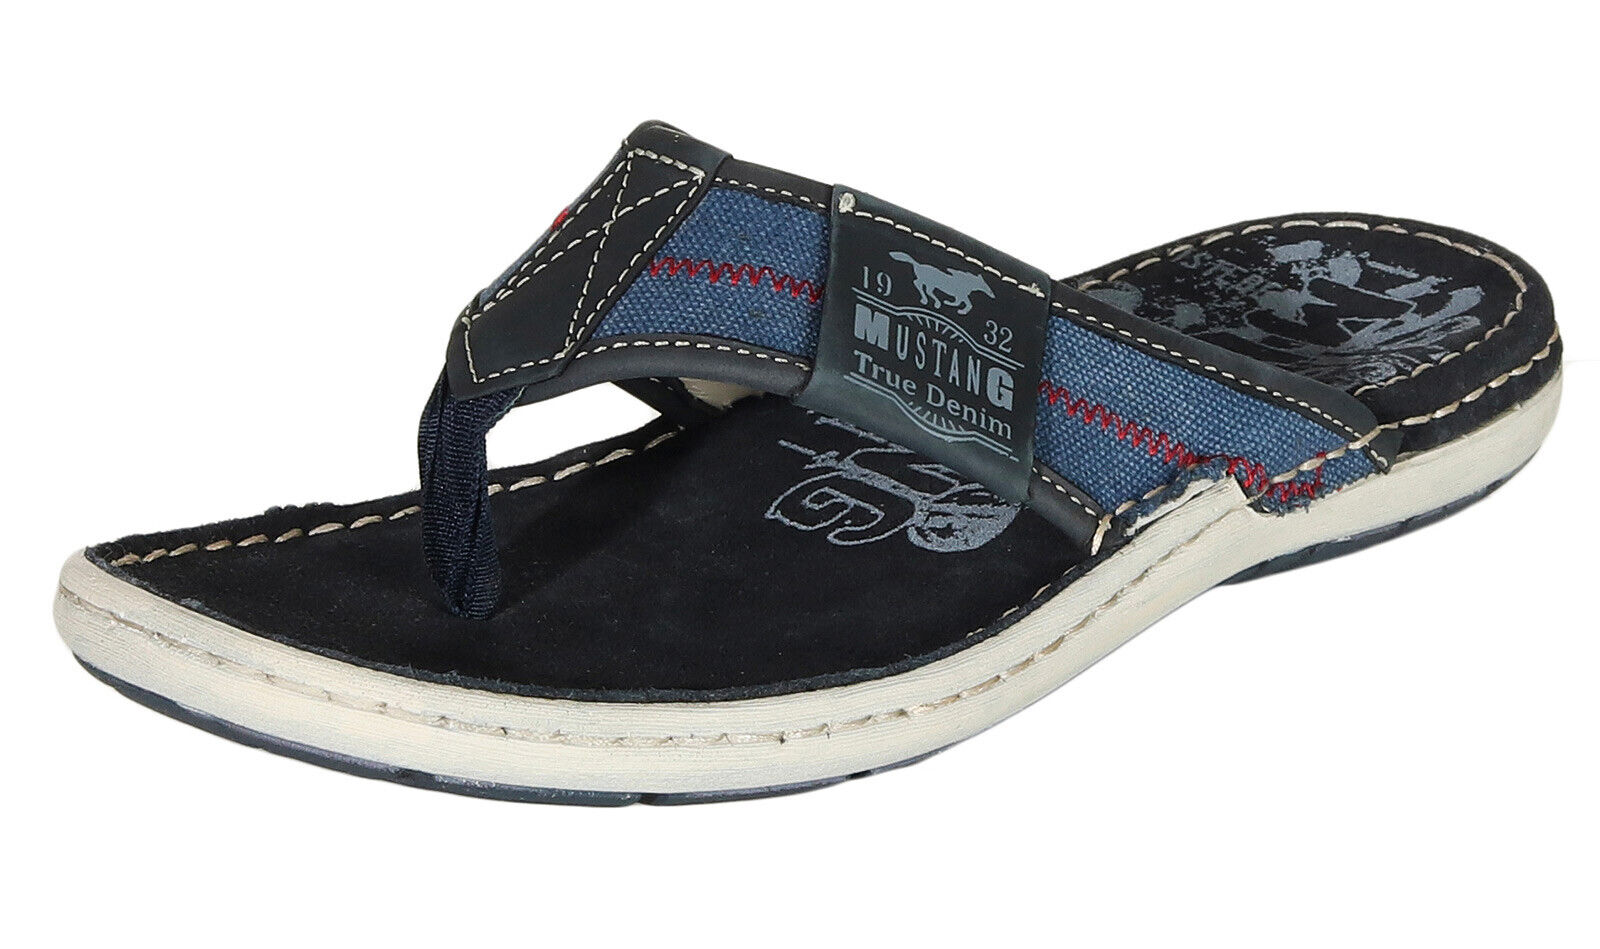 Mustang Herren Sandalen Schuhe Zehentrenner Sommerschuhe Pantoletten 4923-703